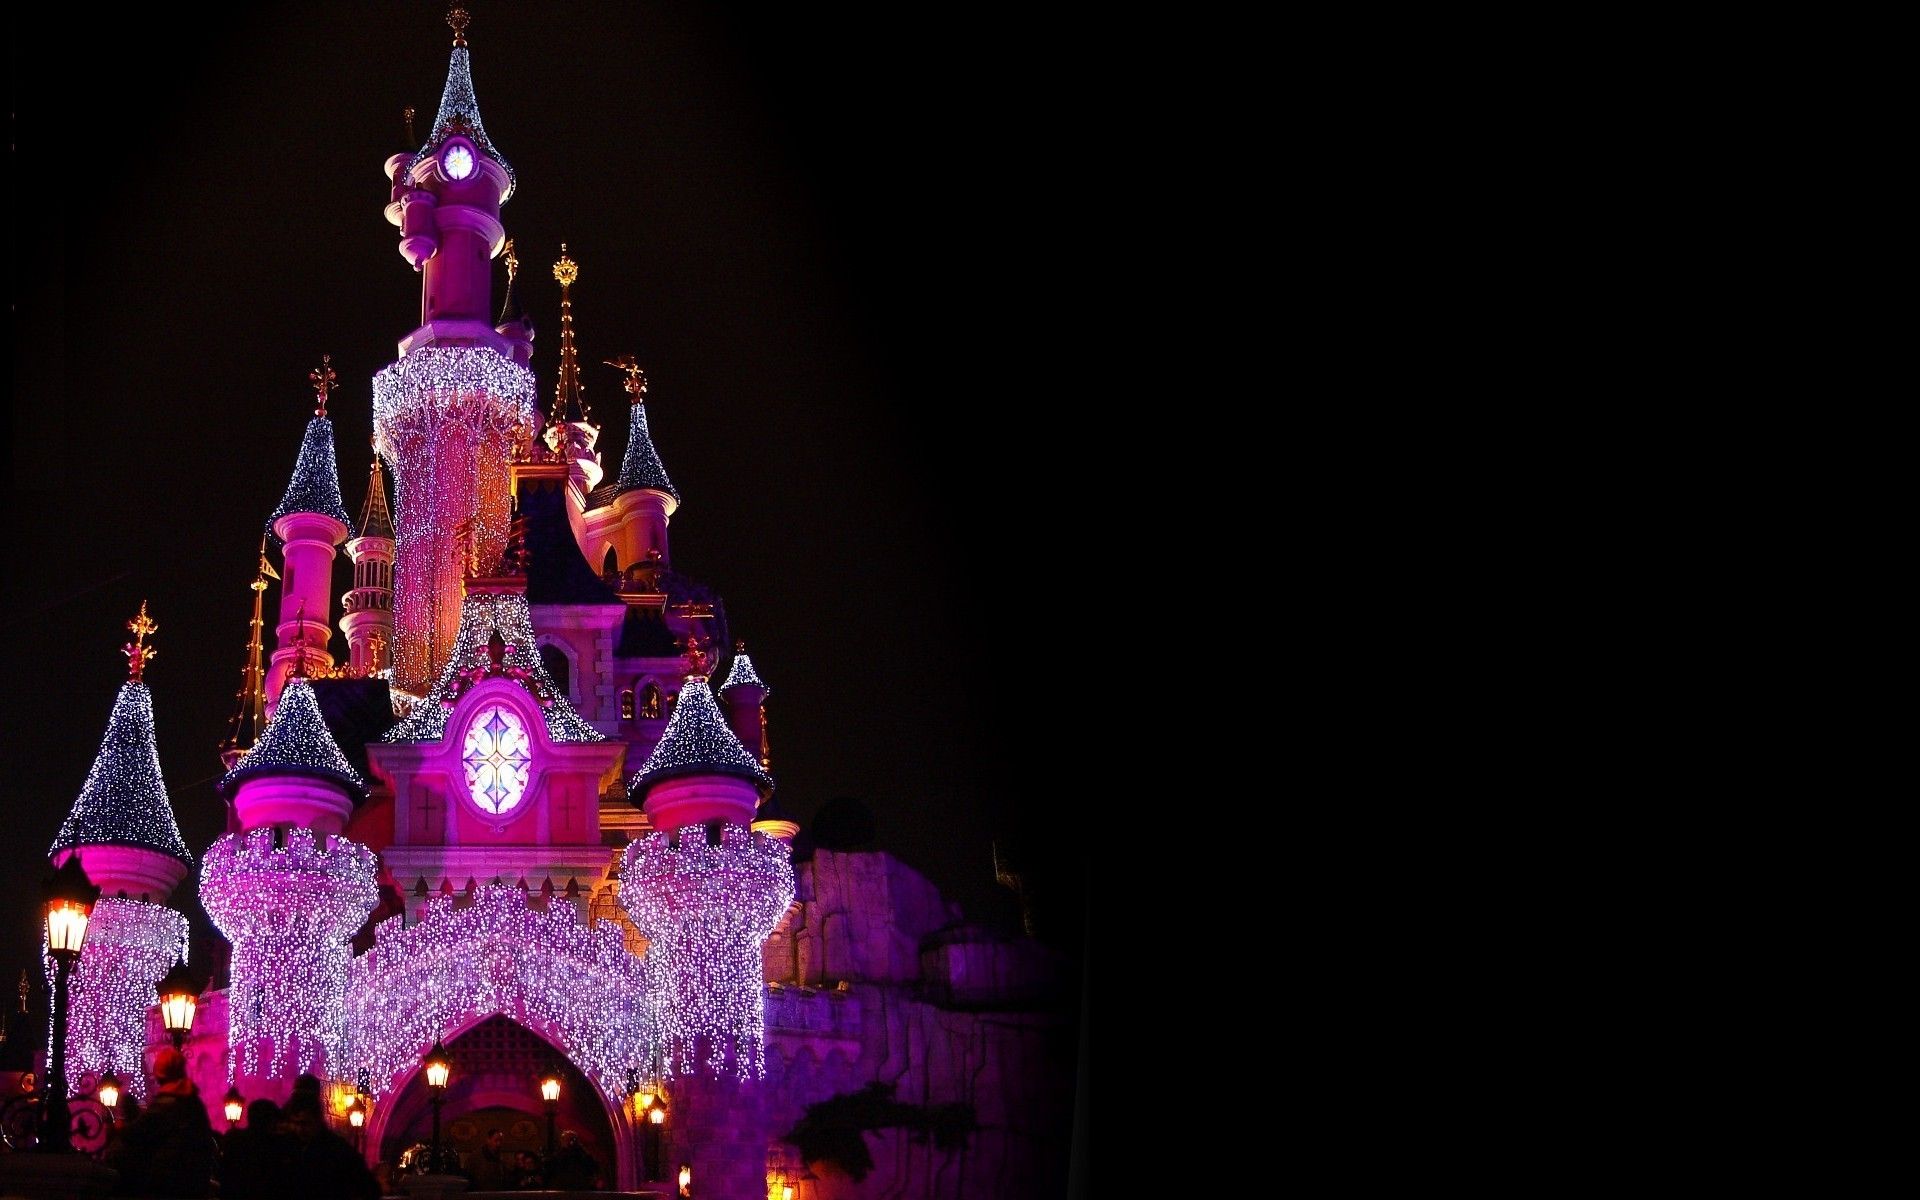 Disney Castle Backgrounds – Wallpaper Zone